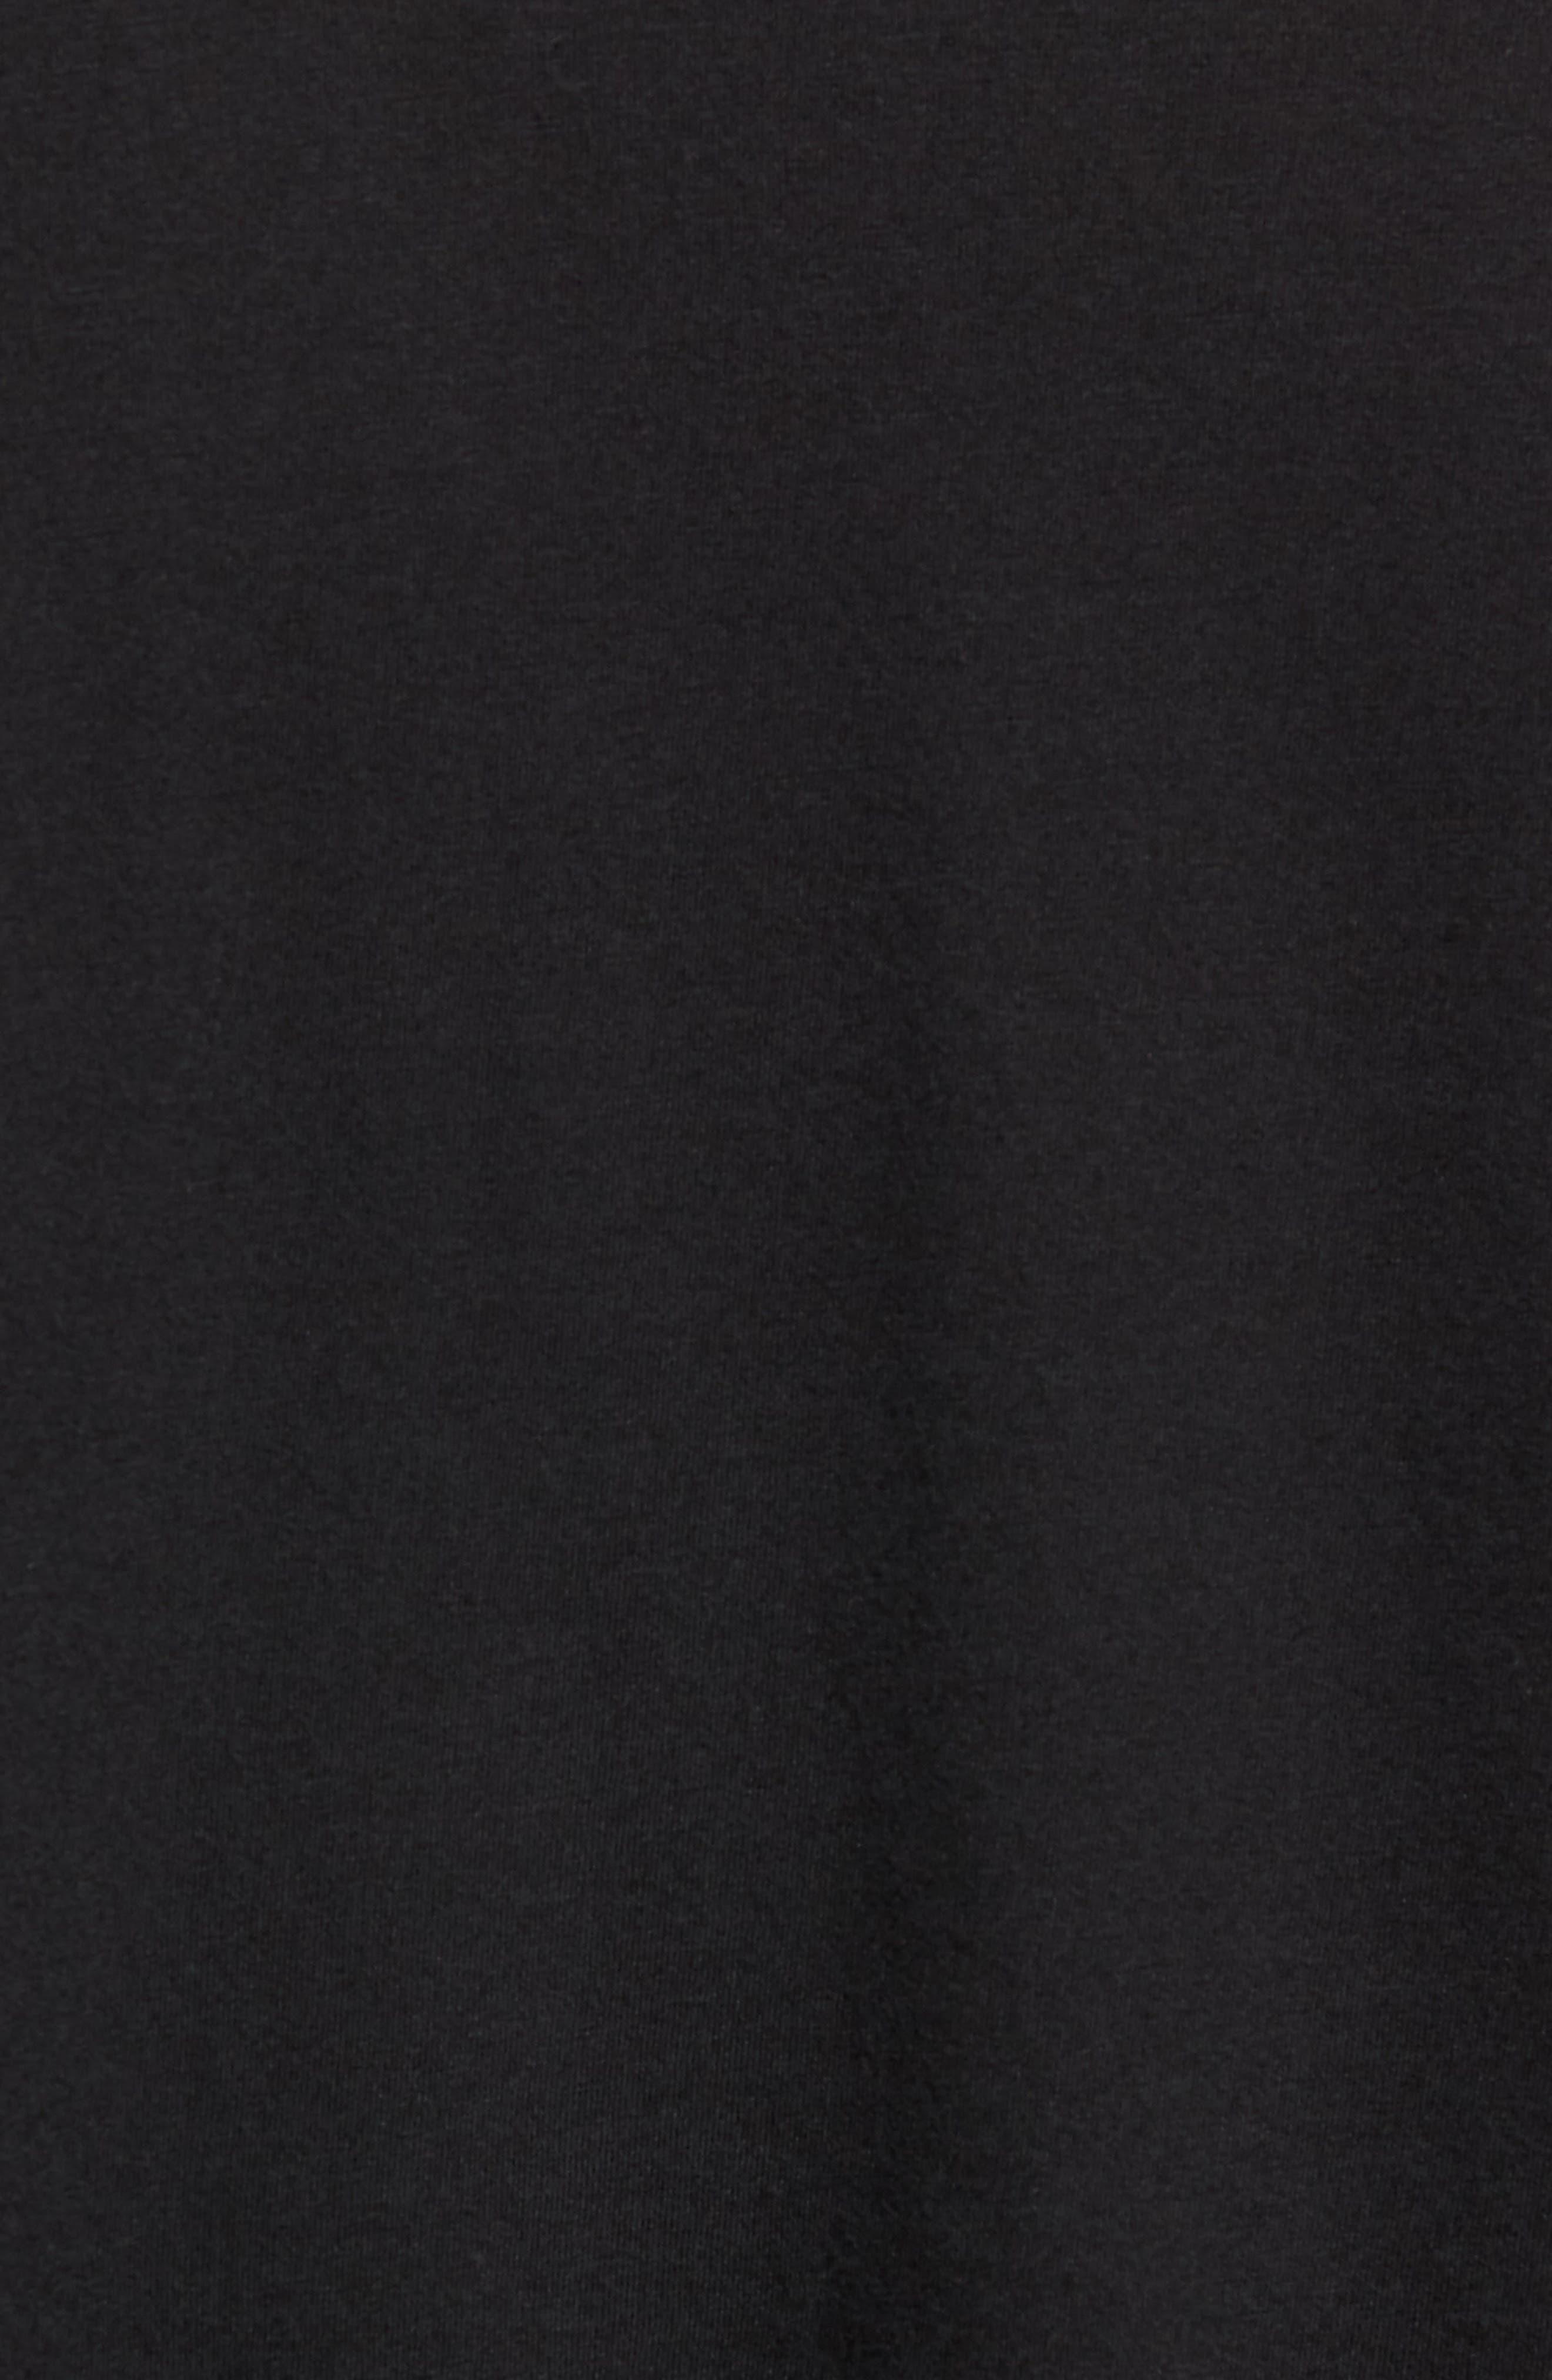 ALO, Triumph Long Raglan Sleeve V-Neck T-Shirt, Alternate thumbnail 5, color, SOLID BLACK TRIBLEND